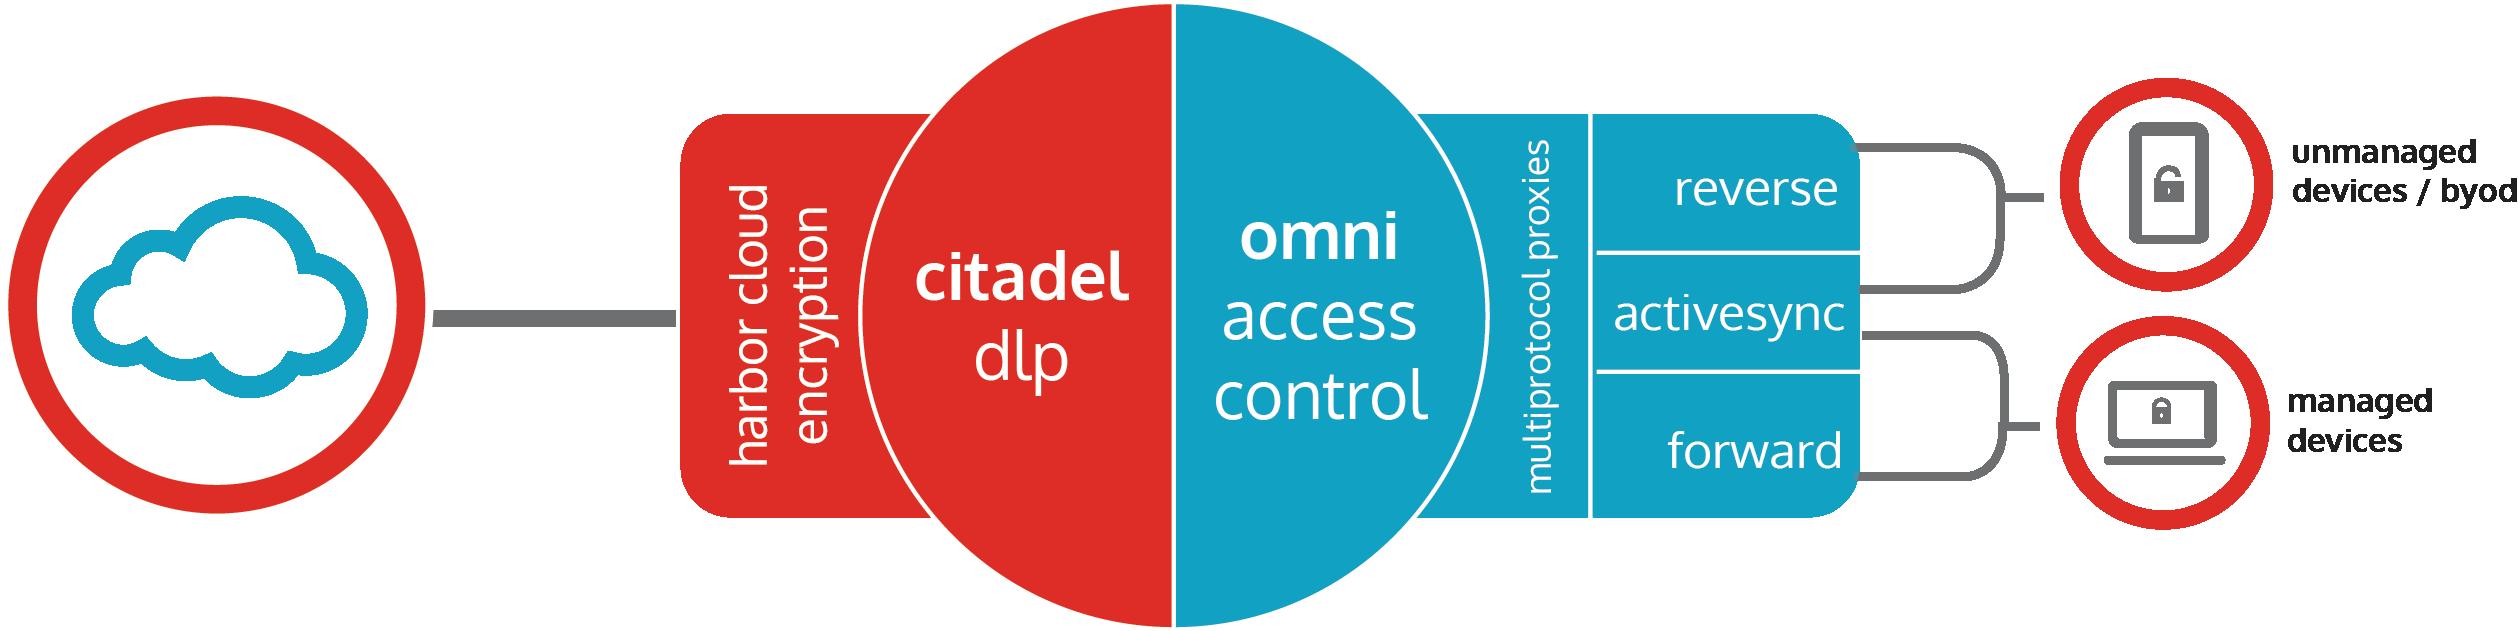 bitglass technical diagram